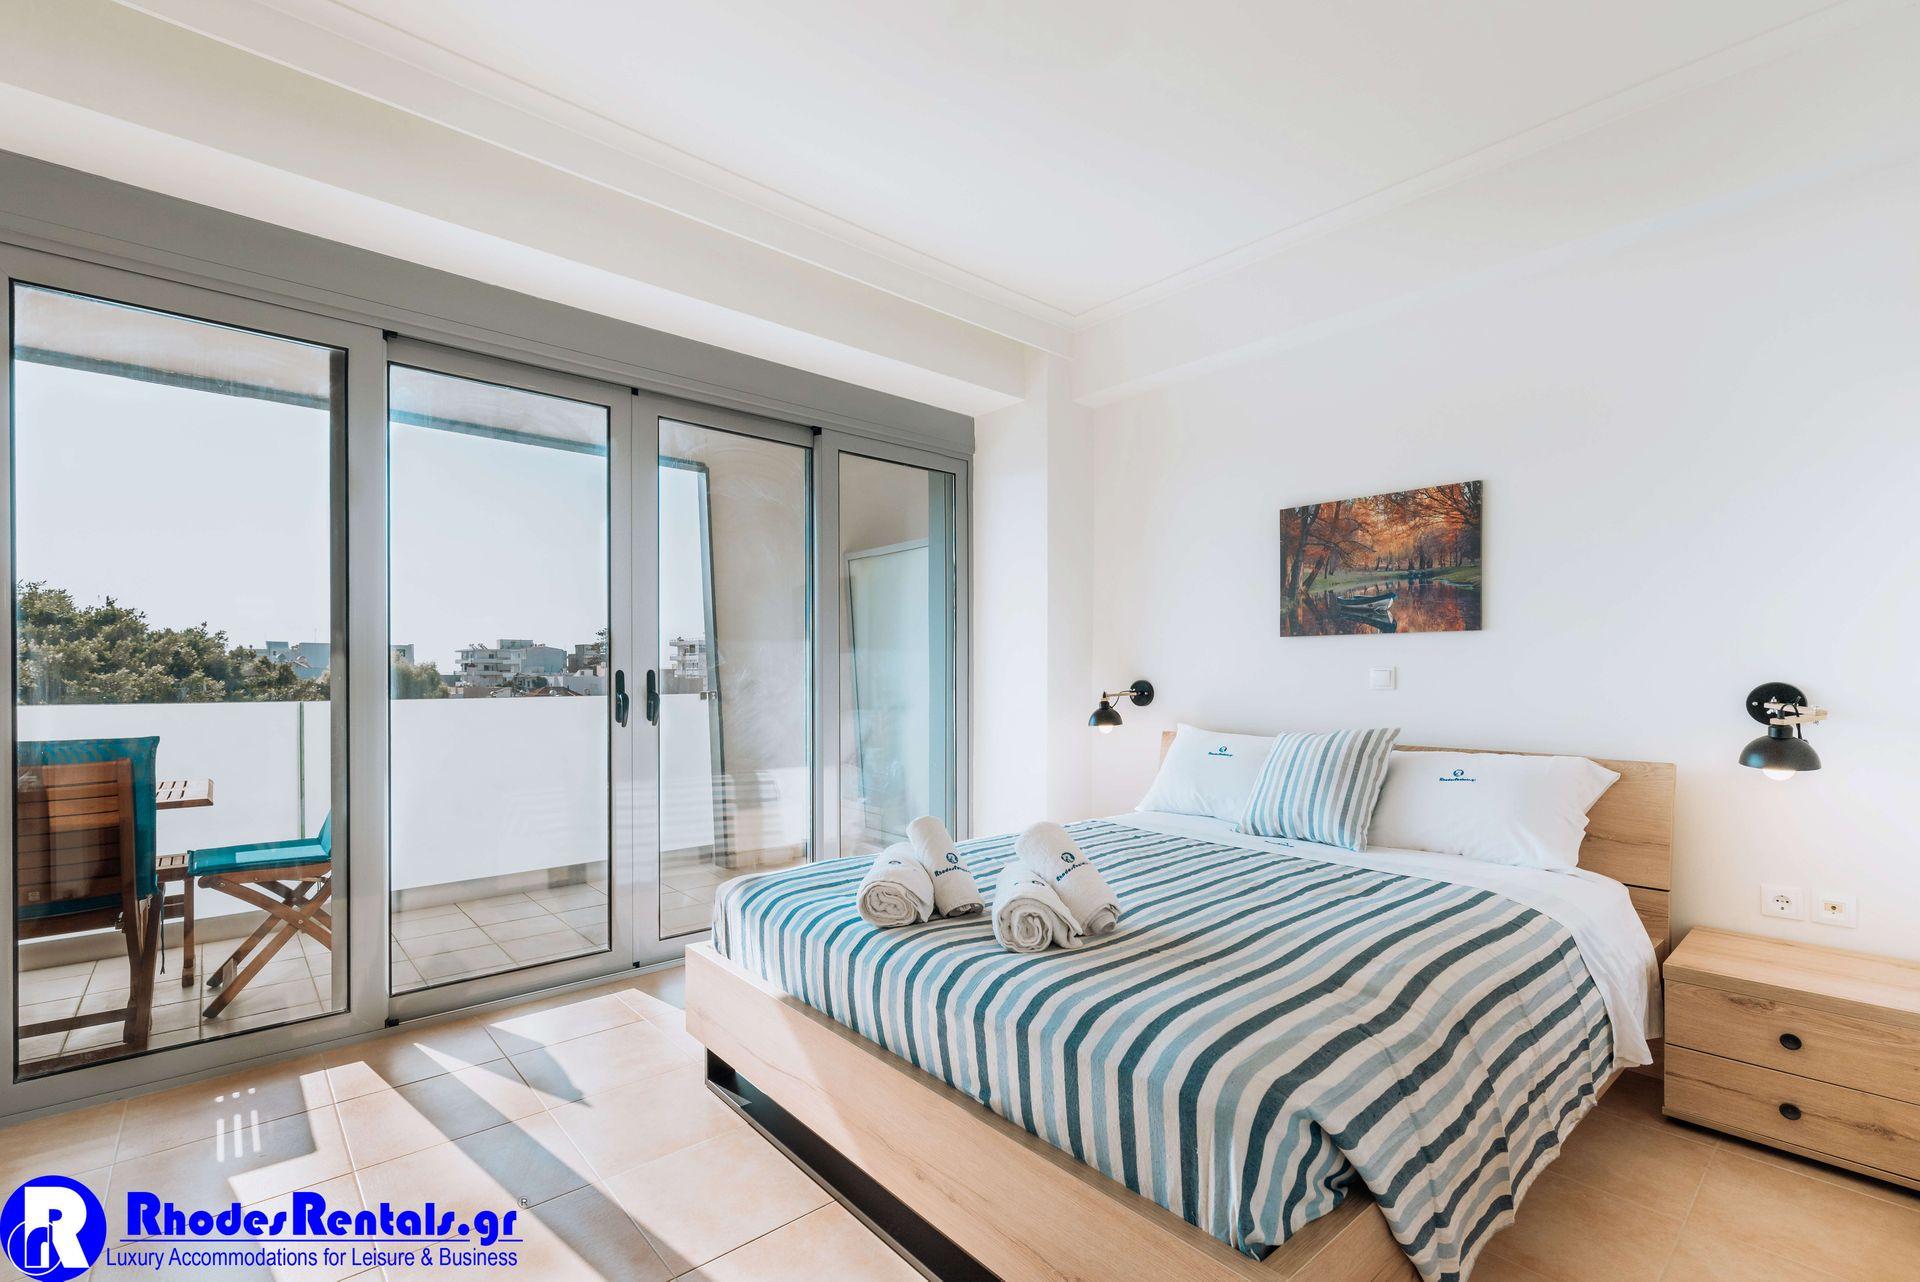 Rhodes Port Haven Suite - Ρόδος ✦ -7% ✦ 2 Ημέρες (1